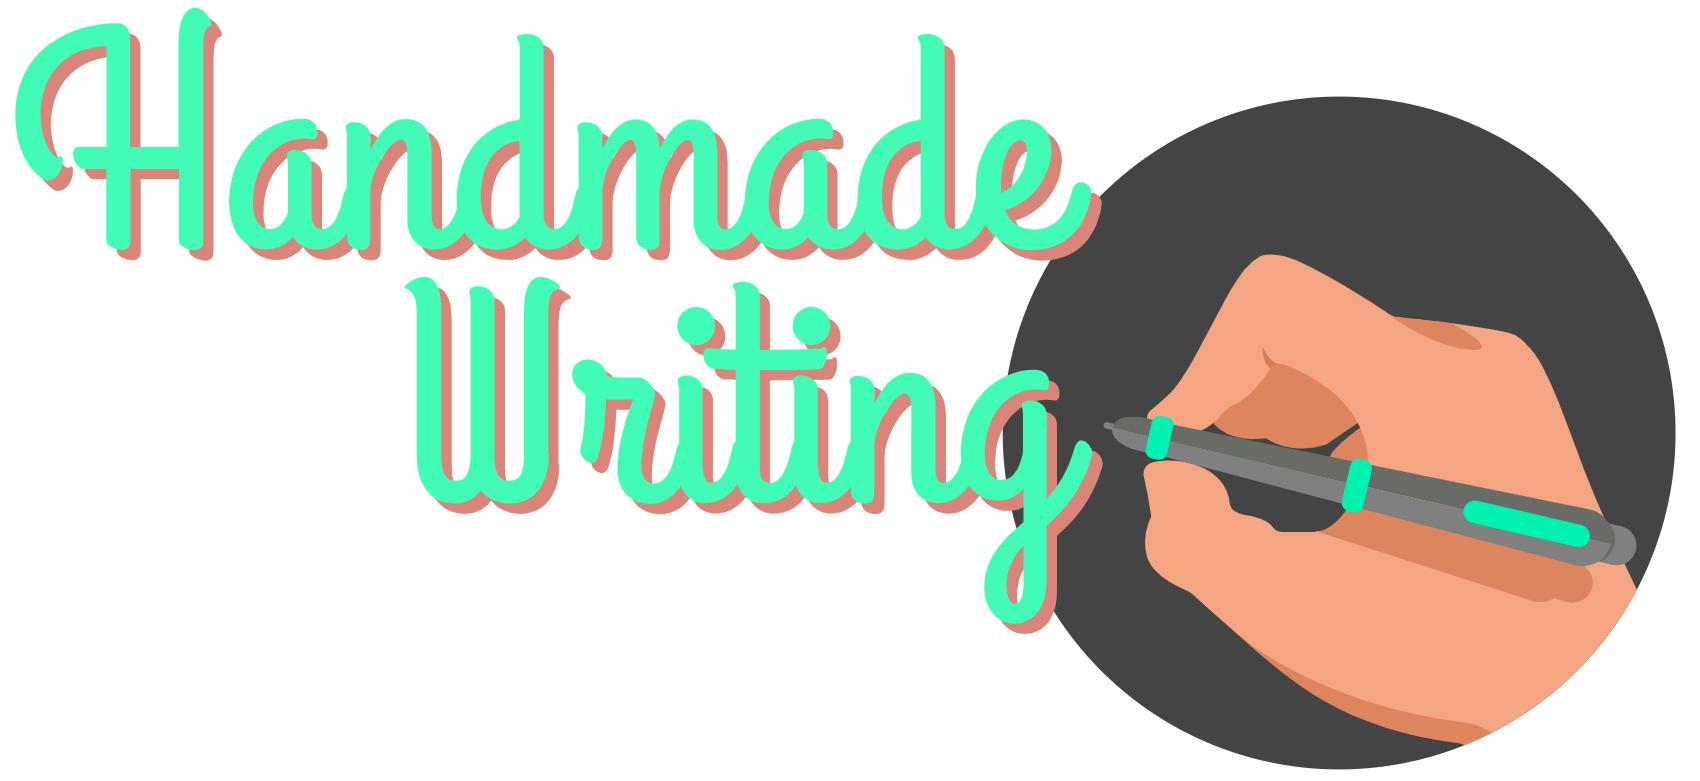 Popular best essay writers website for masters essay national honer scoiety